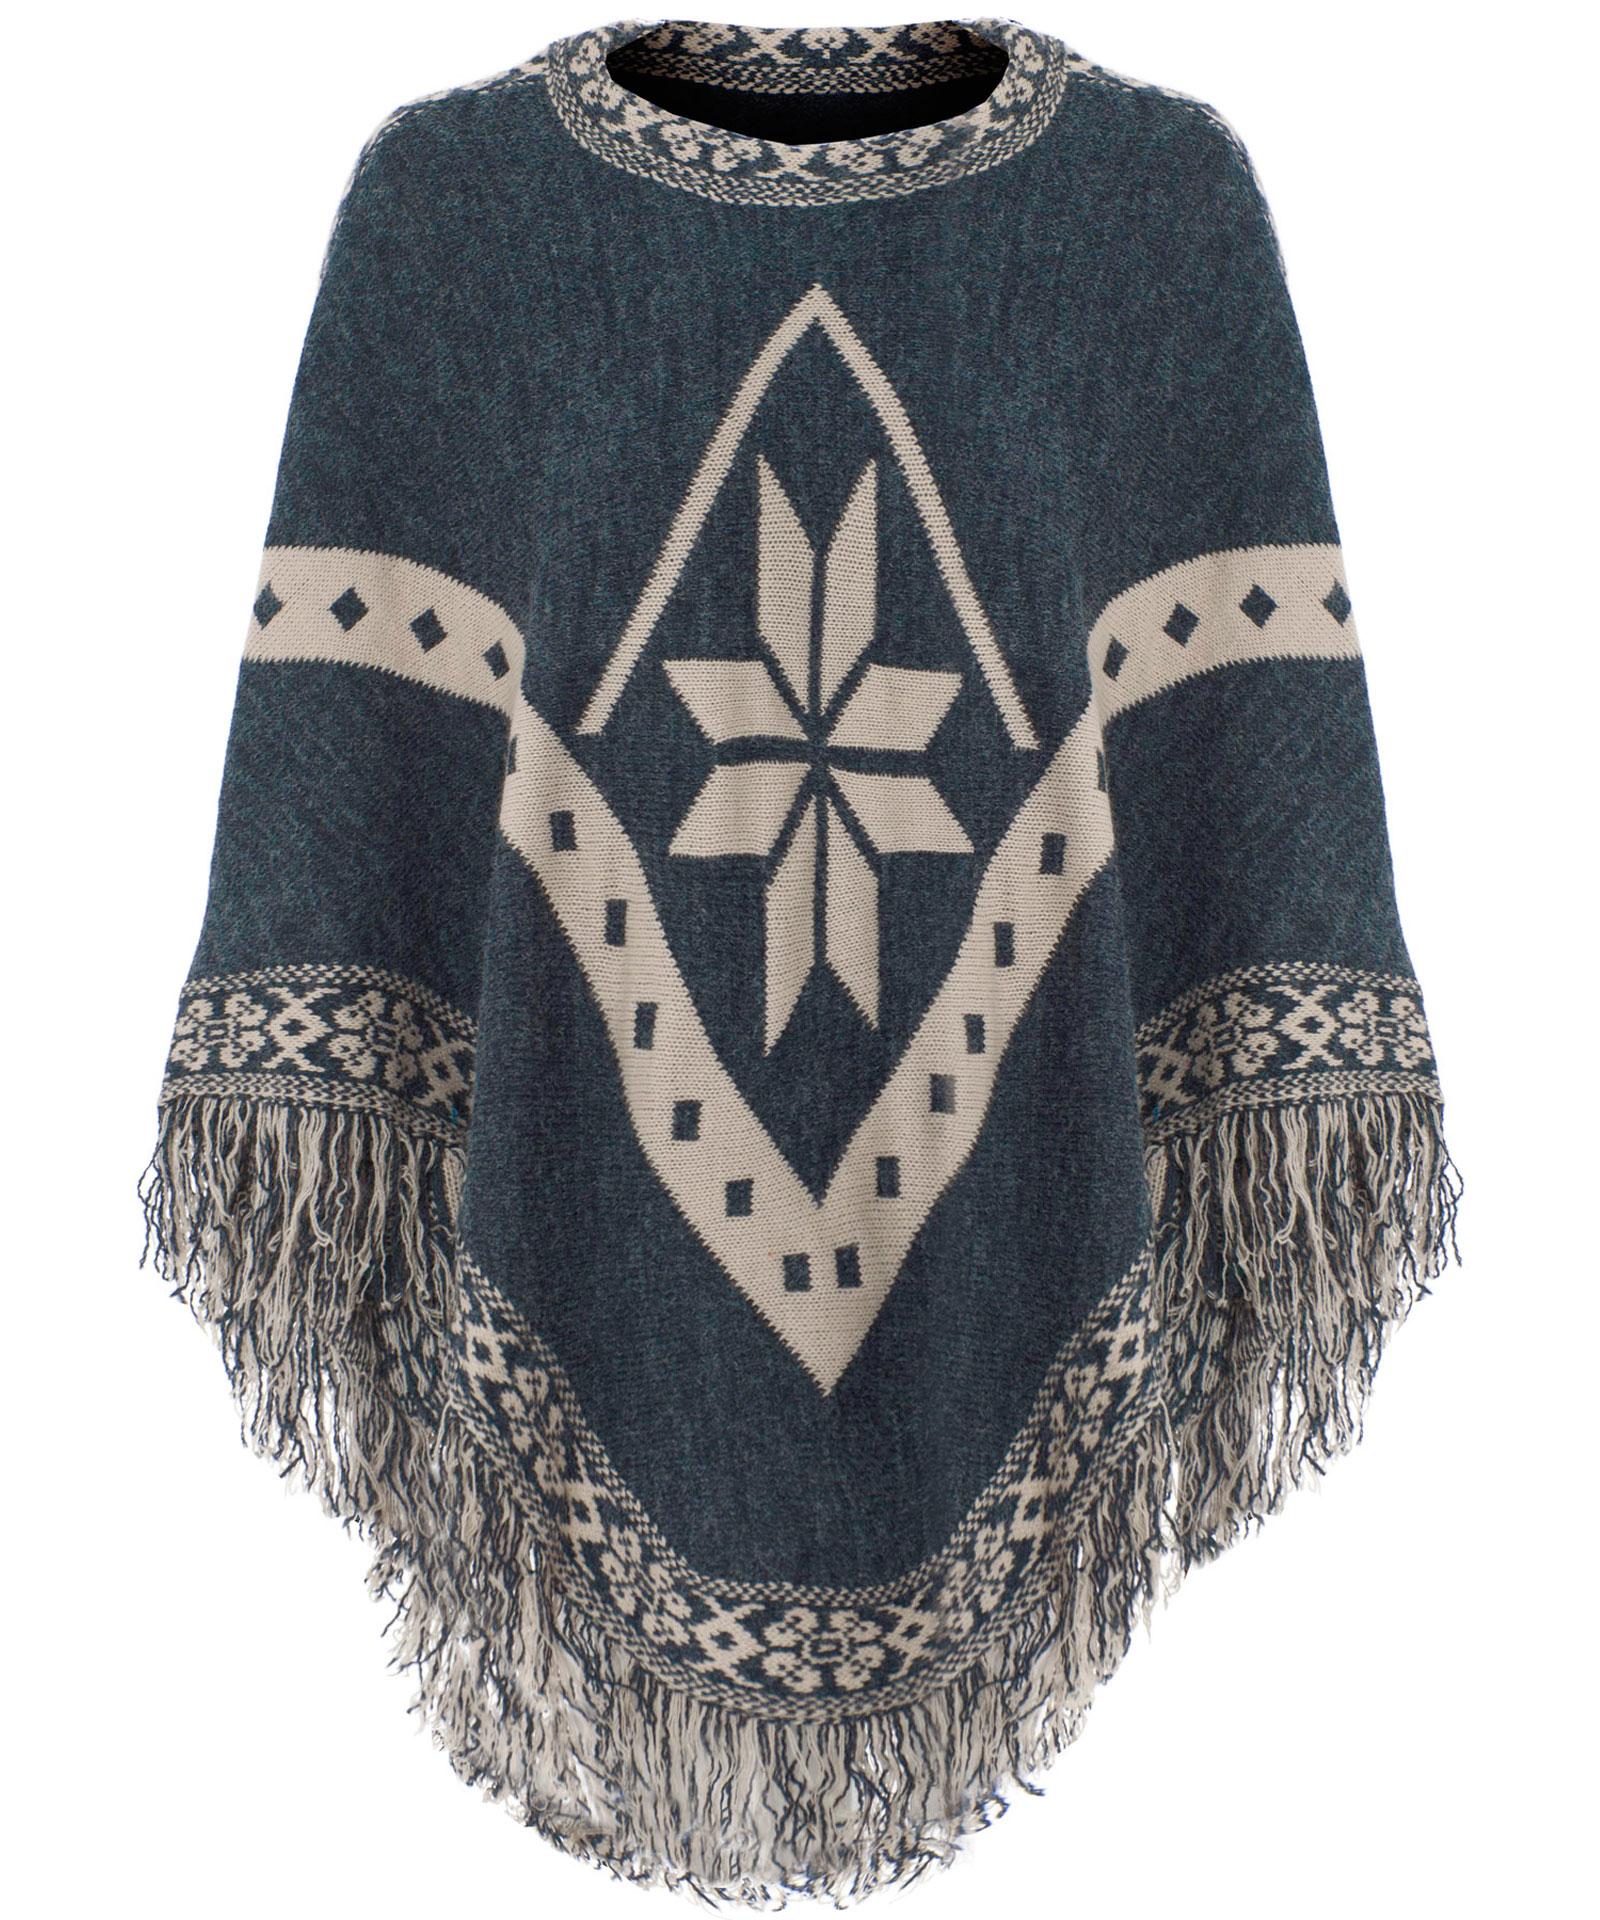 View Item Snowflake Tassel Fringe Knitted Poncho